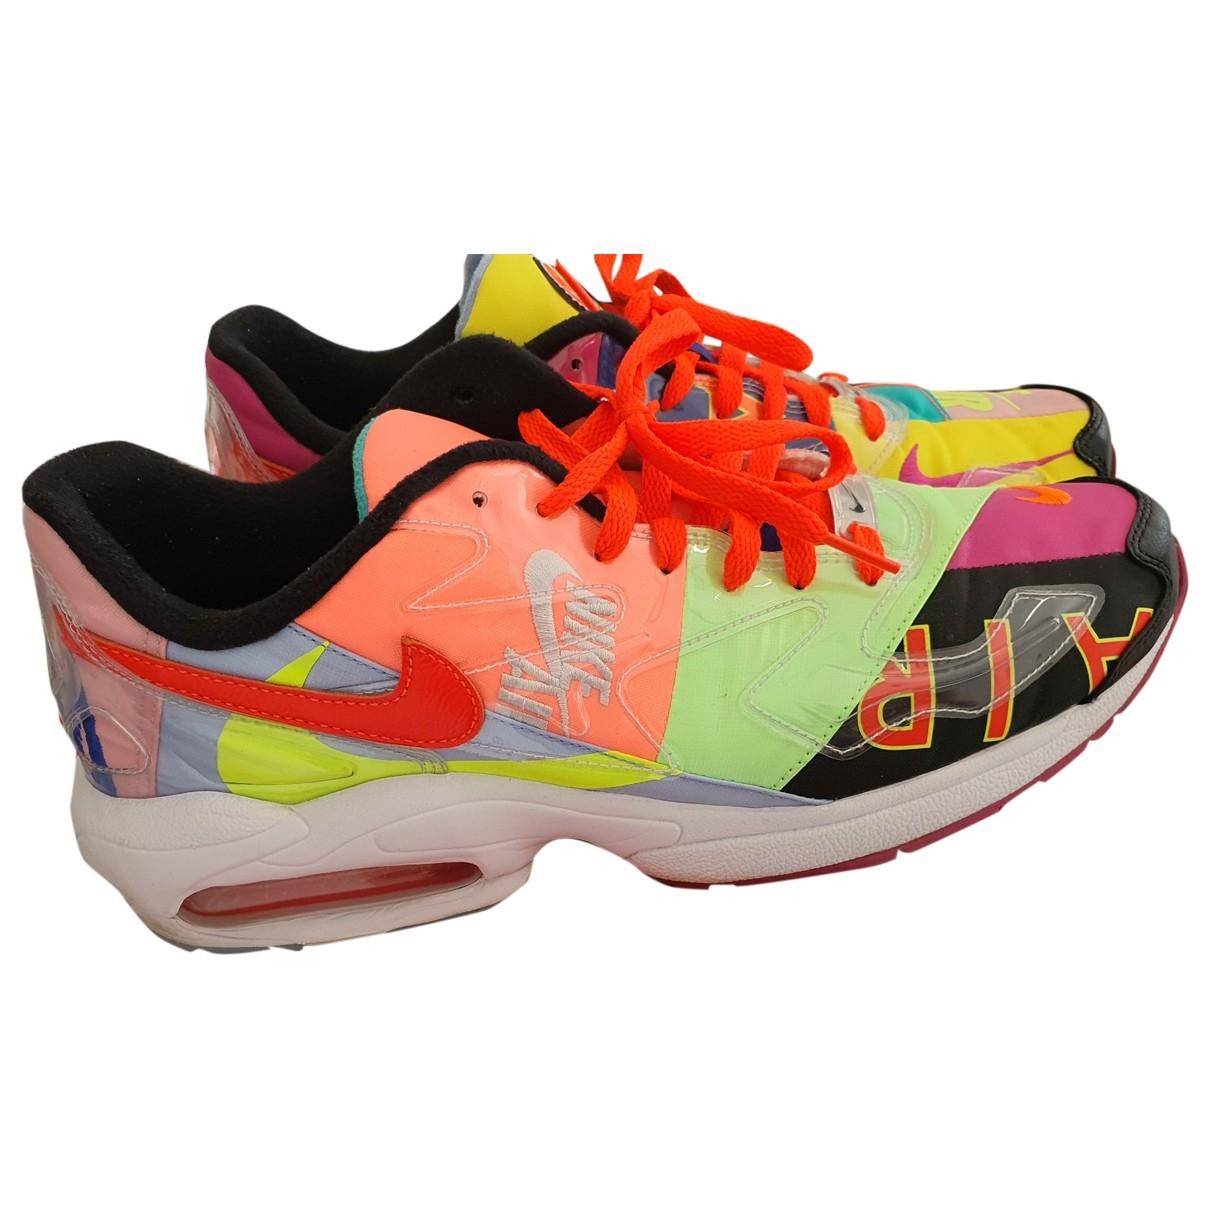 Nike - Baskets Air Max 2 Light pour homme - multicolore